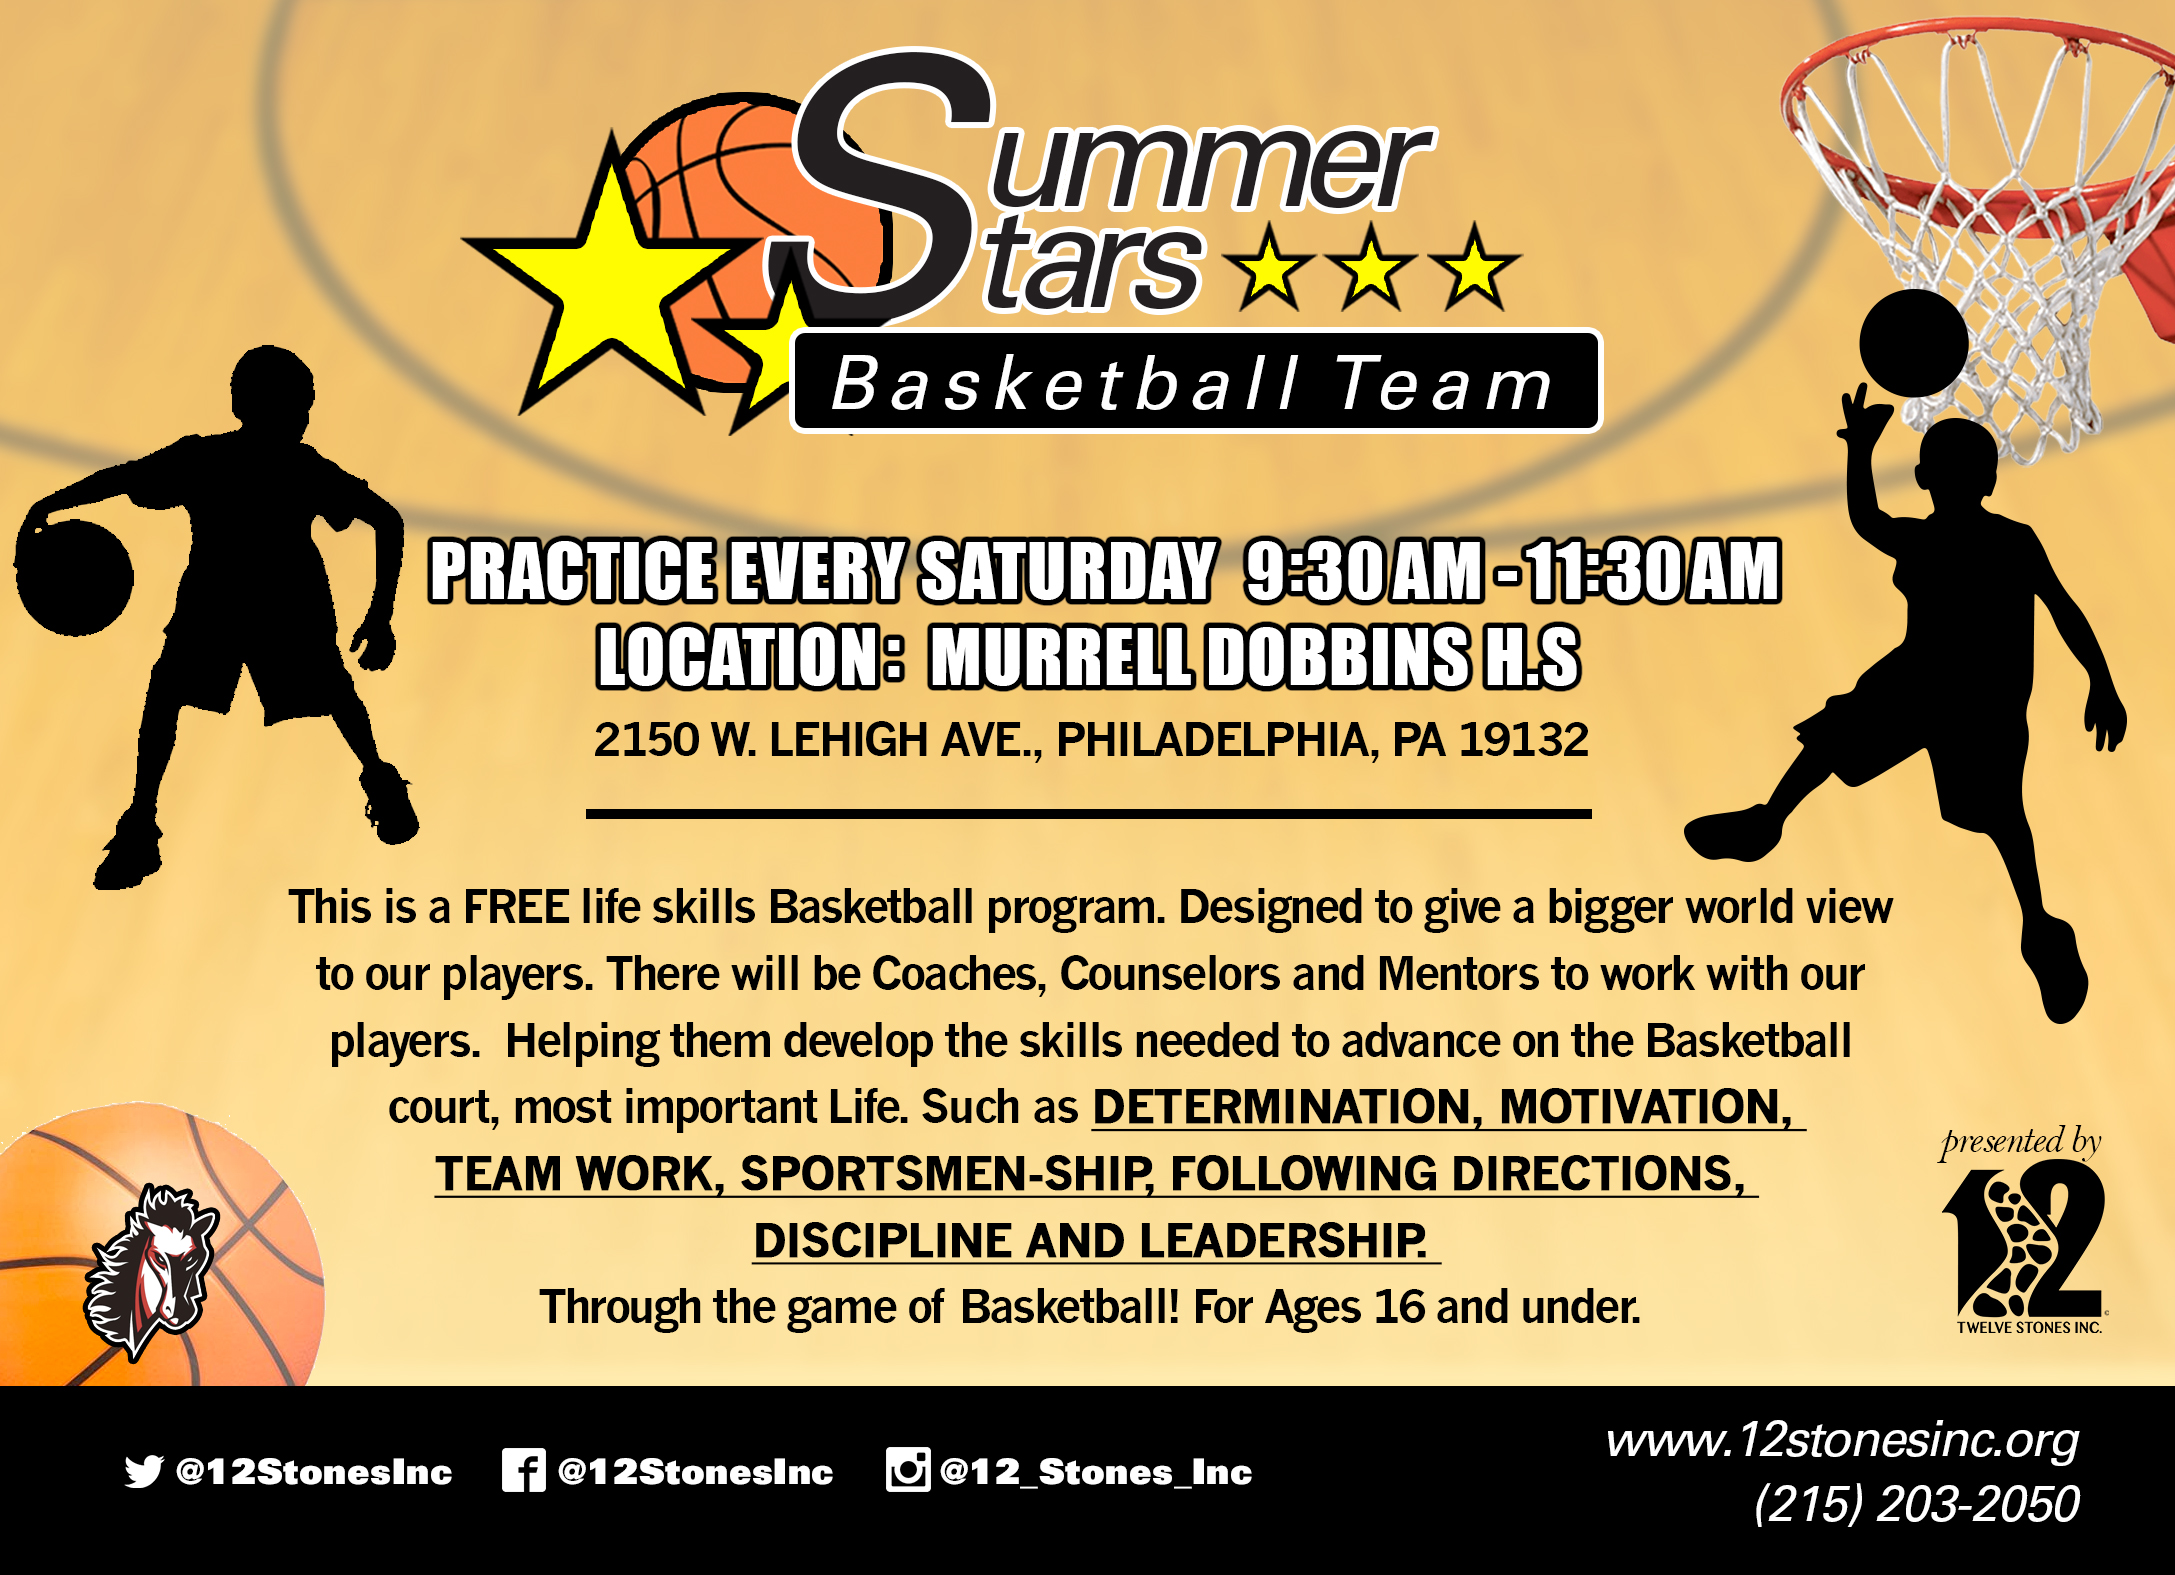 SummerStarsBBall_Flyer5x7